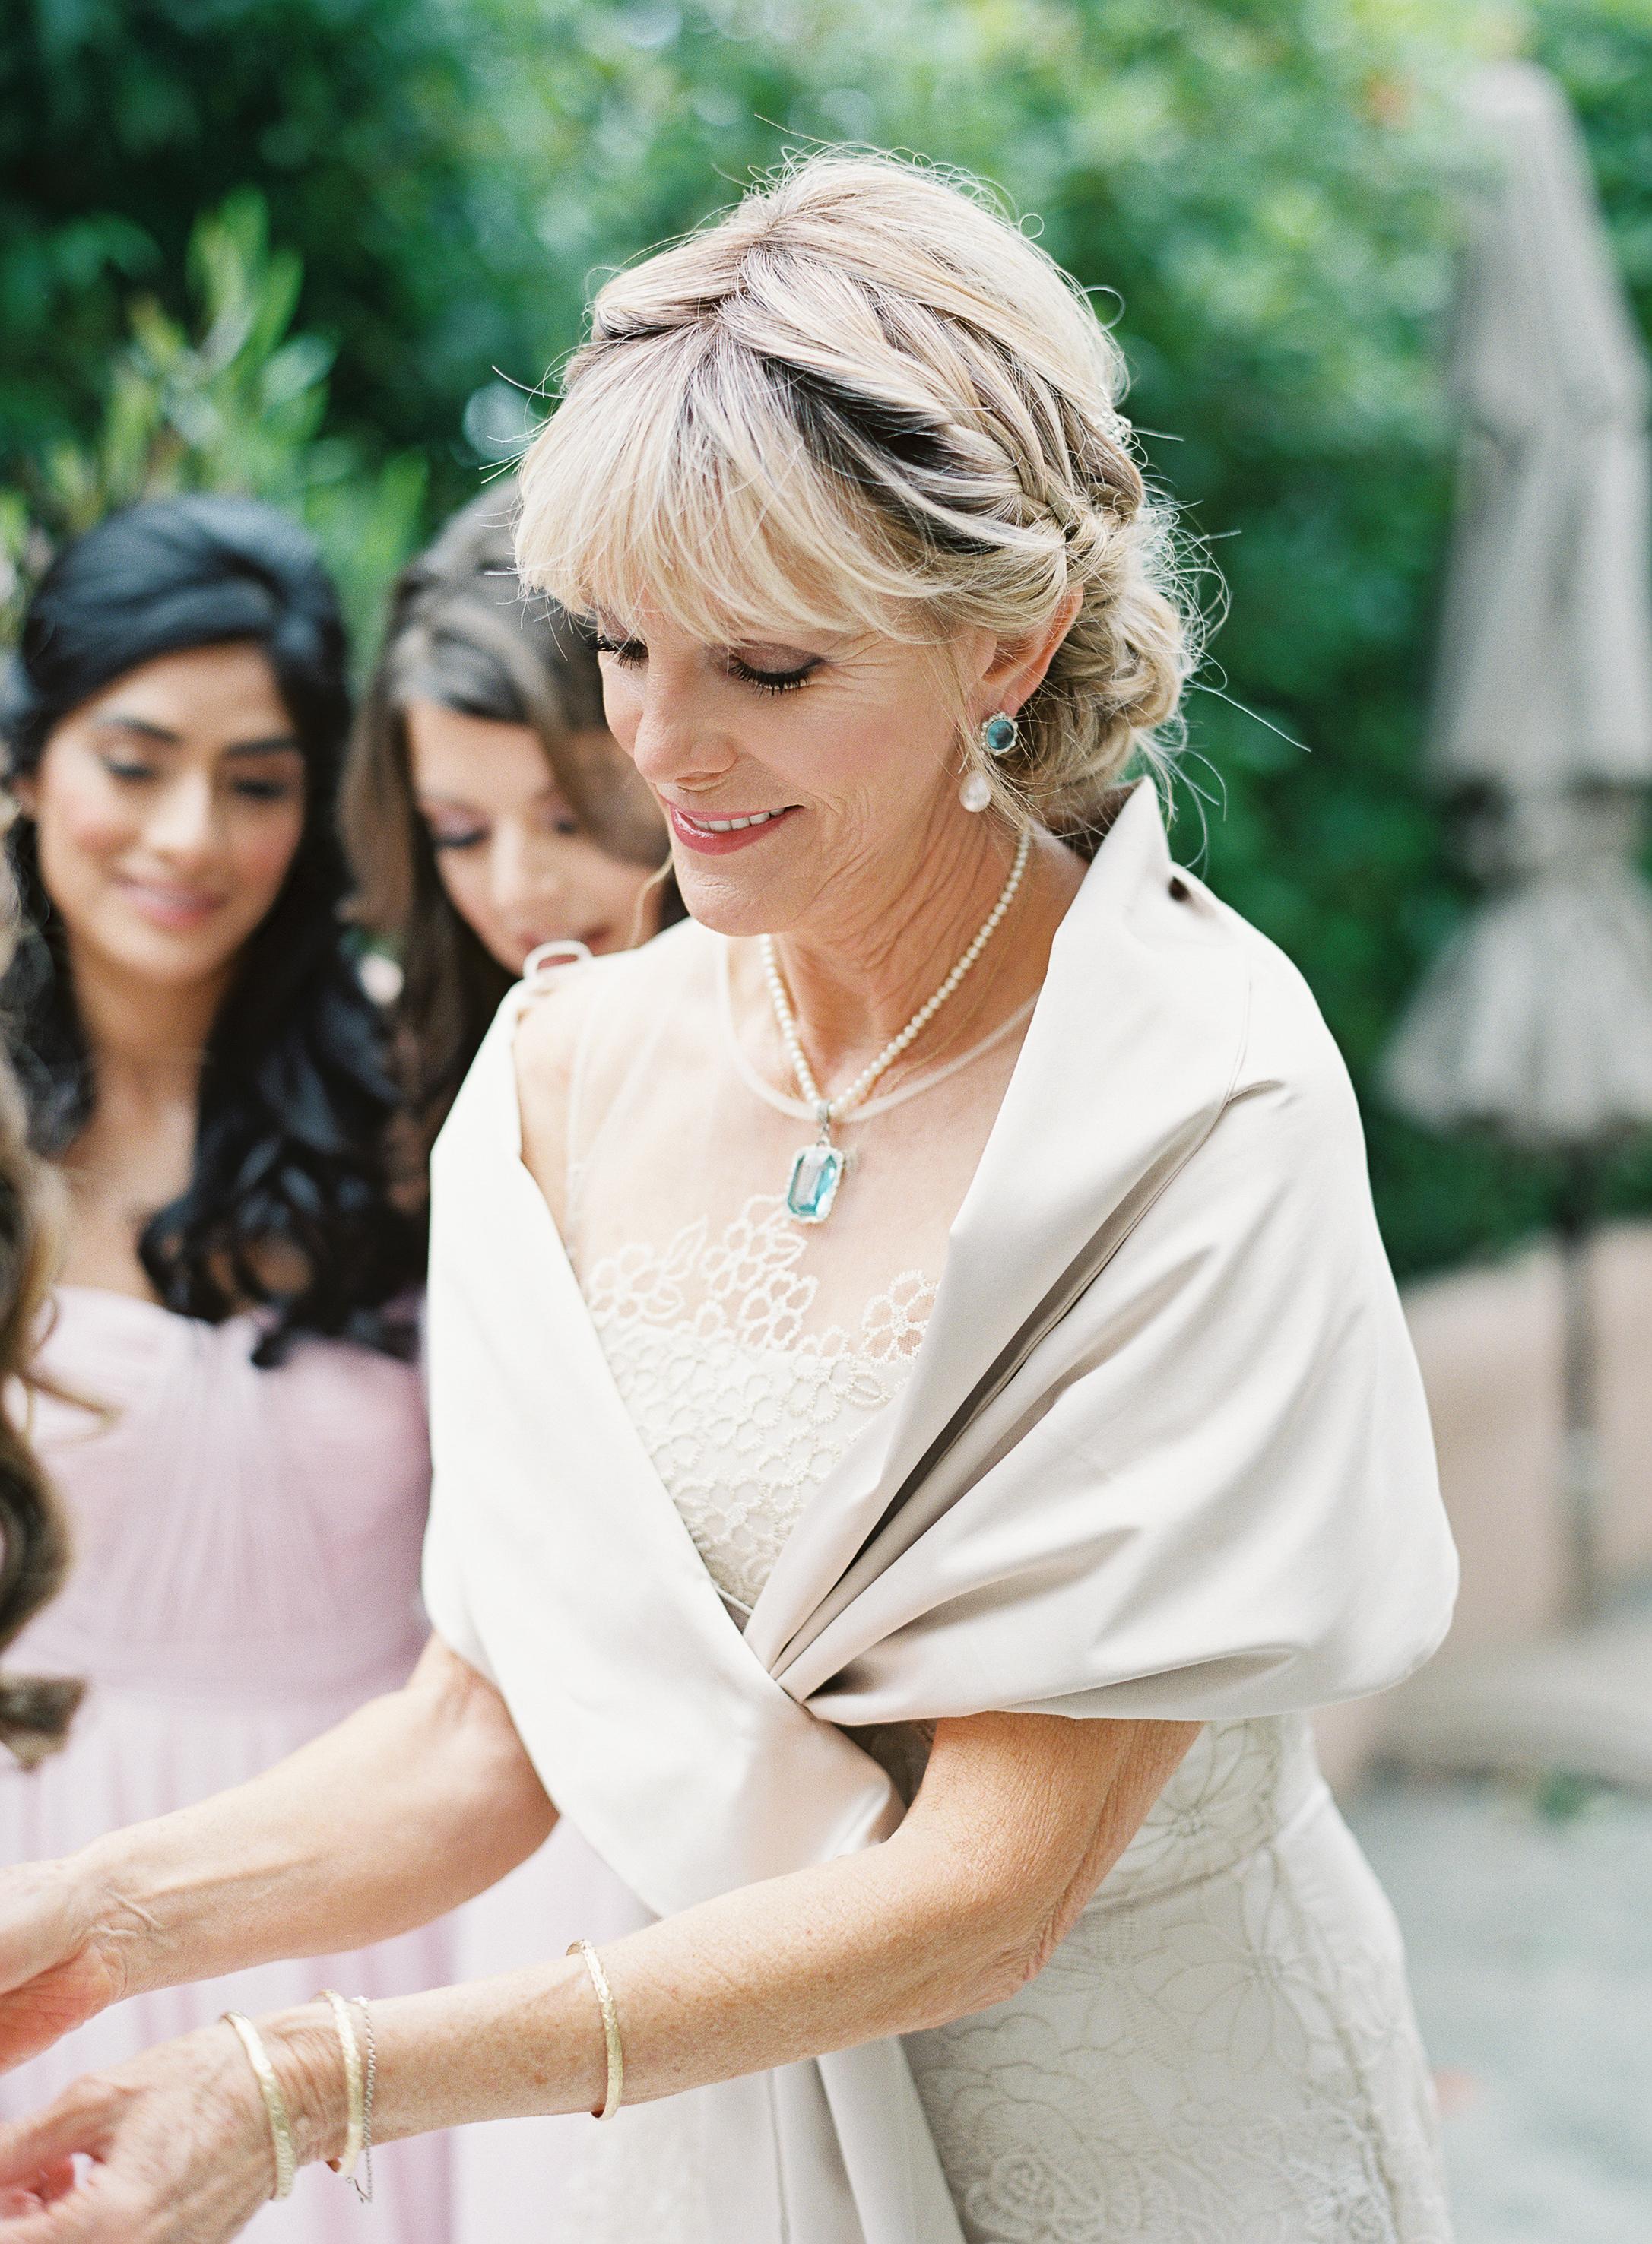 Meghan Mehan Photography | Fine Art Film Wedding Photographer | California | San Francisco | Napa | Sonoma | Santa Barbara | Big Sur | Destination Wedding Photographer 009.jpg